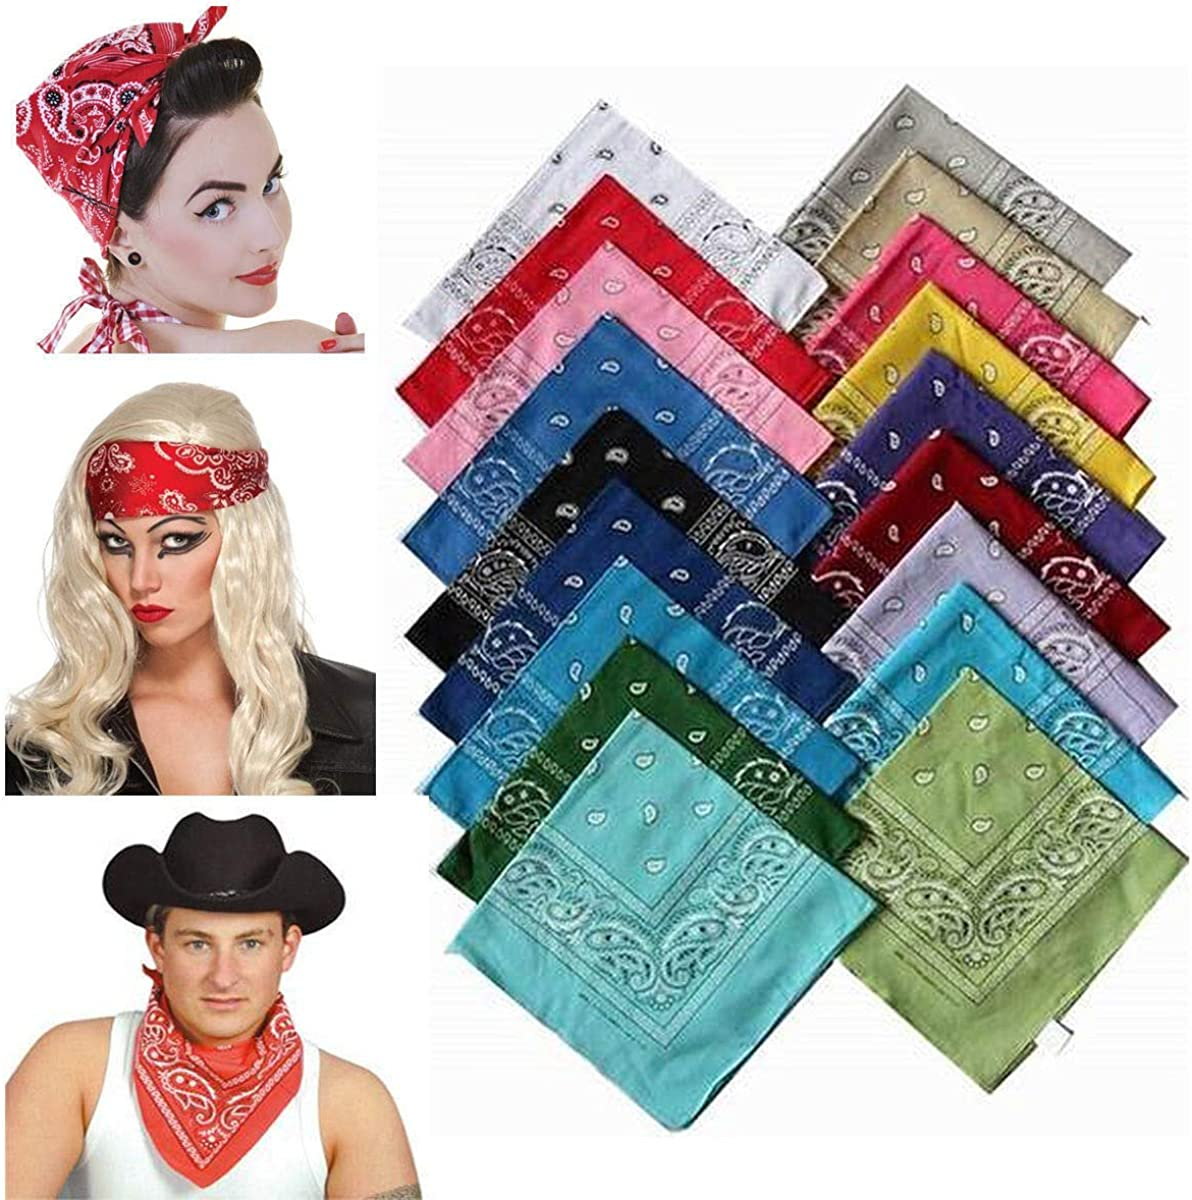 TOYMYTOY 100/% Polyester Bandanas Multi-Purpose Paisley Bandanas Headband Pack of 12,21x 21 inch Random Color